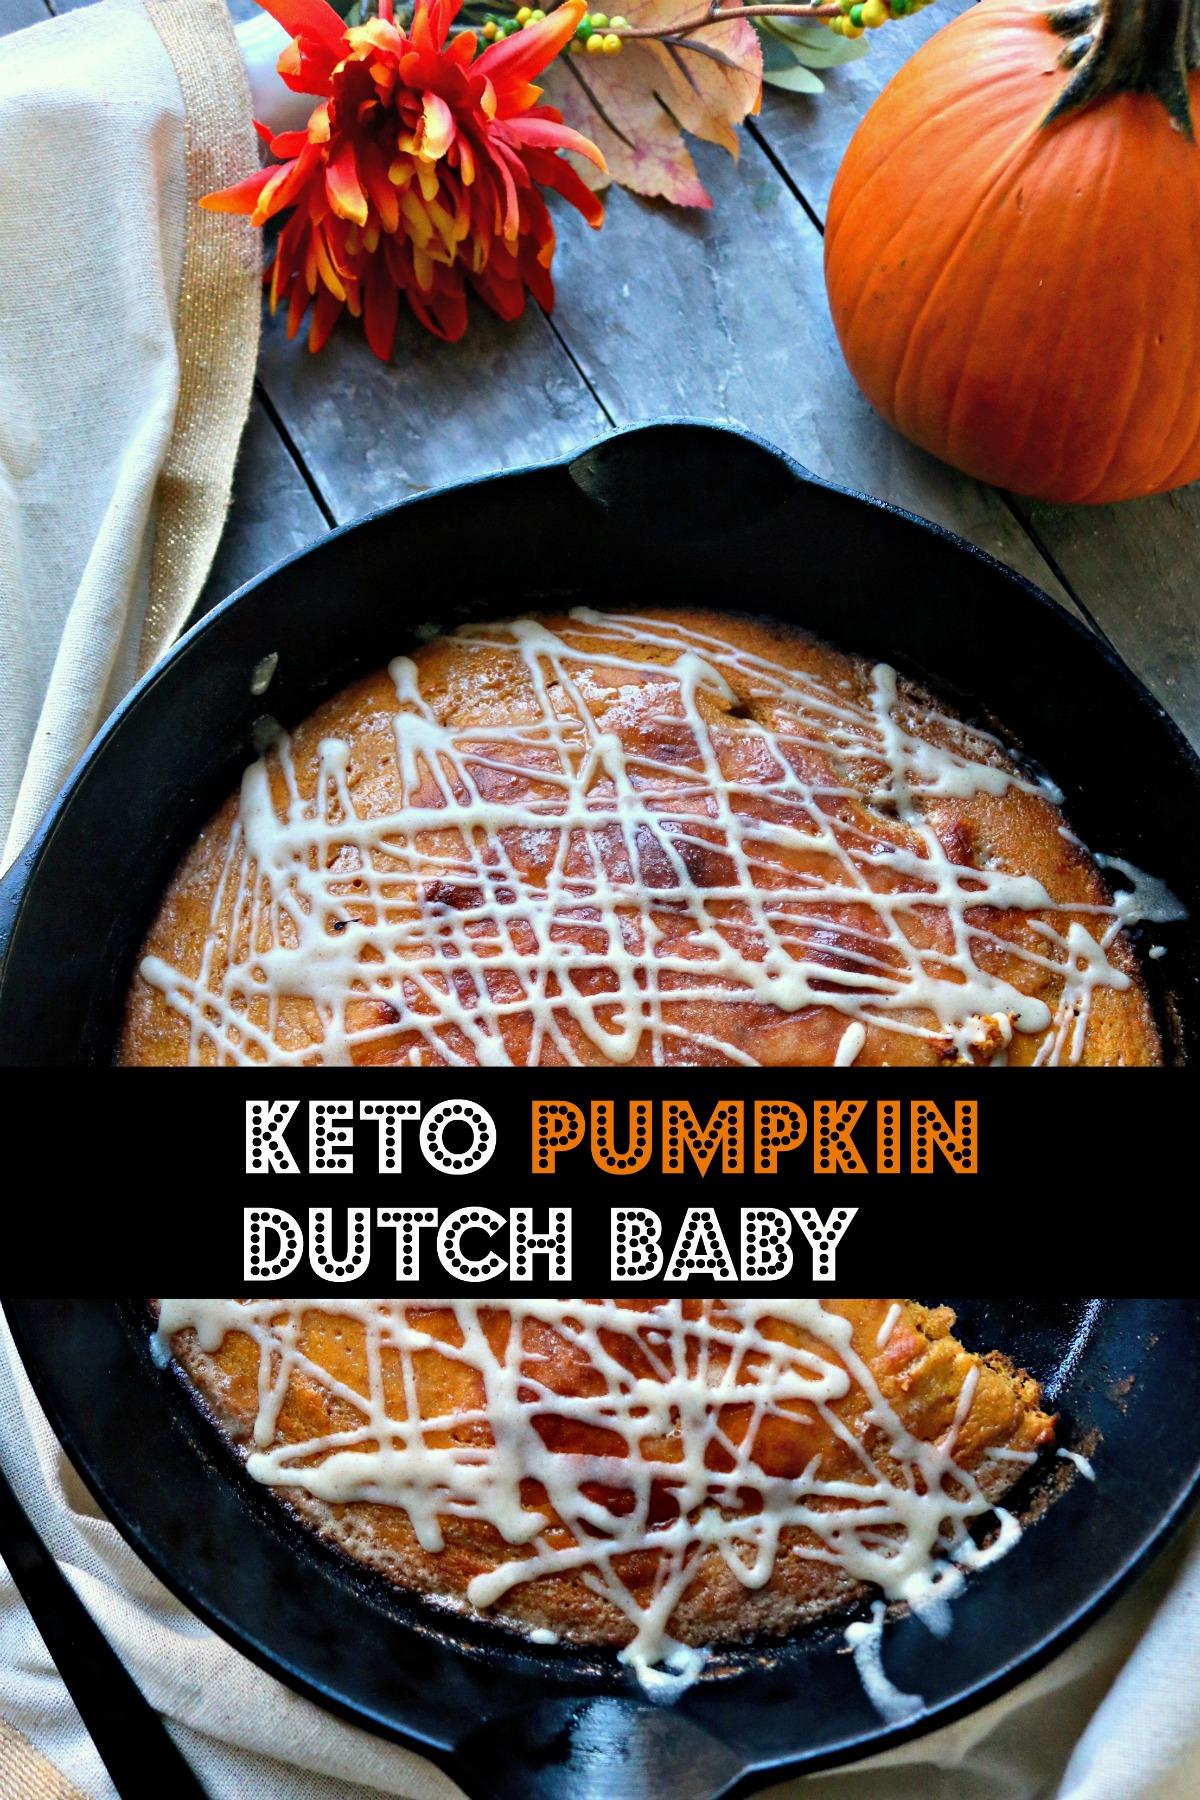 Brunch, Breakfast Keto Pumpkin Dutch Baby with Cream Cheese Glaze. Low Carb, Almond Flour, Easy mix, bake for 15 minutes. #ketodutchbaby #ketopumpkindutchbaby #spinachtiger #lowcarbketobreakfast #ketobreakfast #ketopumpkinrecipe #ketobakedpancake  via @angelaroberts